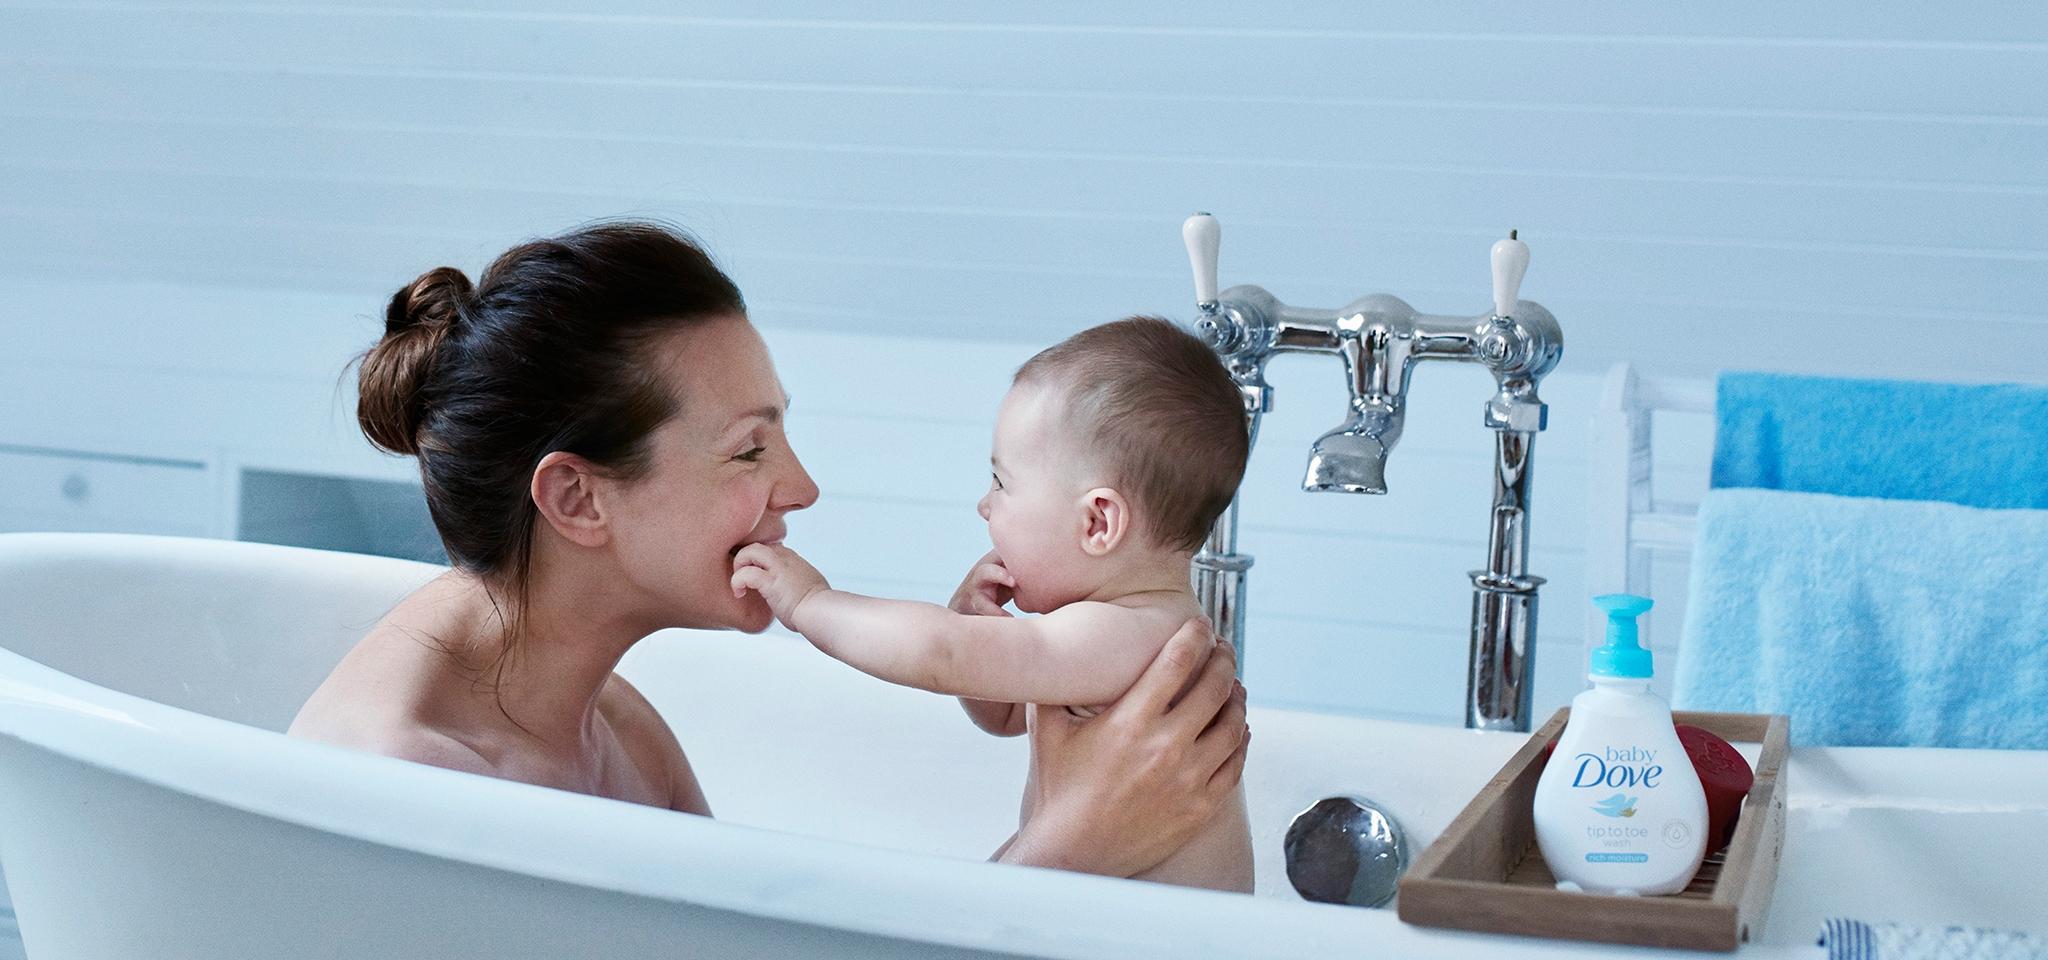 Baby Bathing – Baby Dove